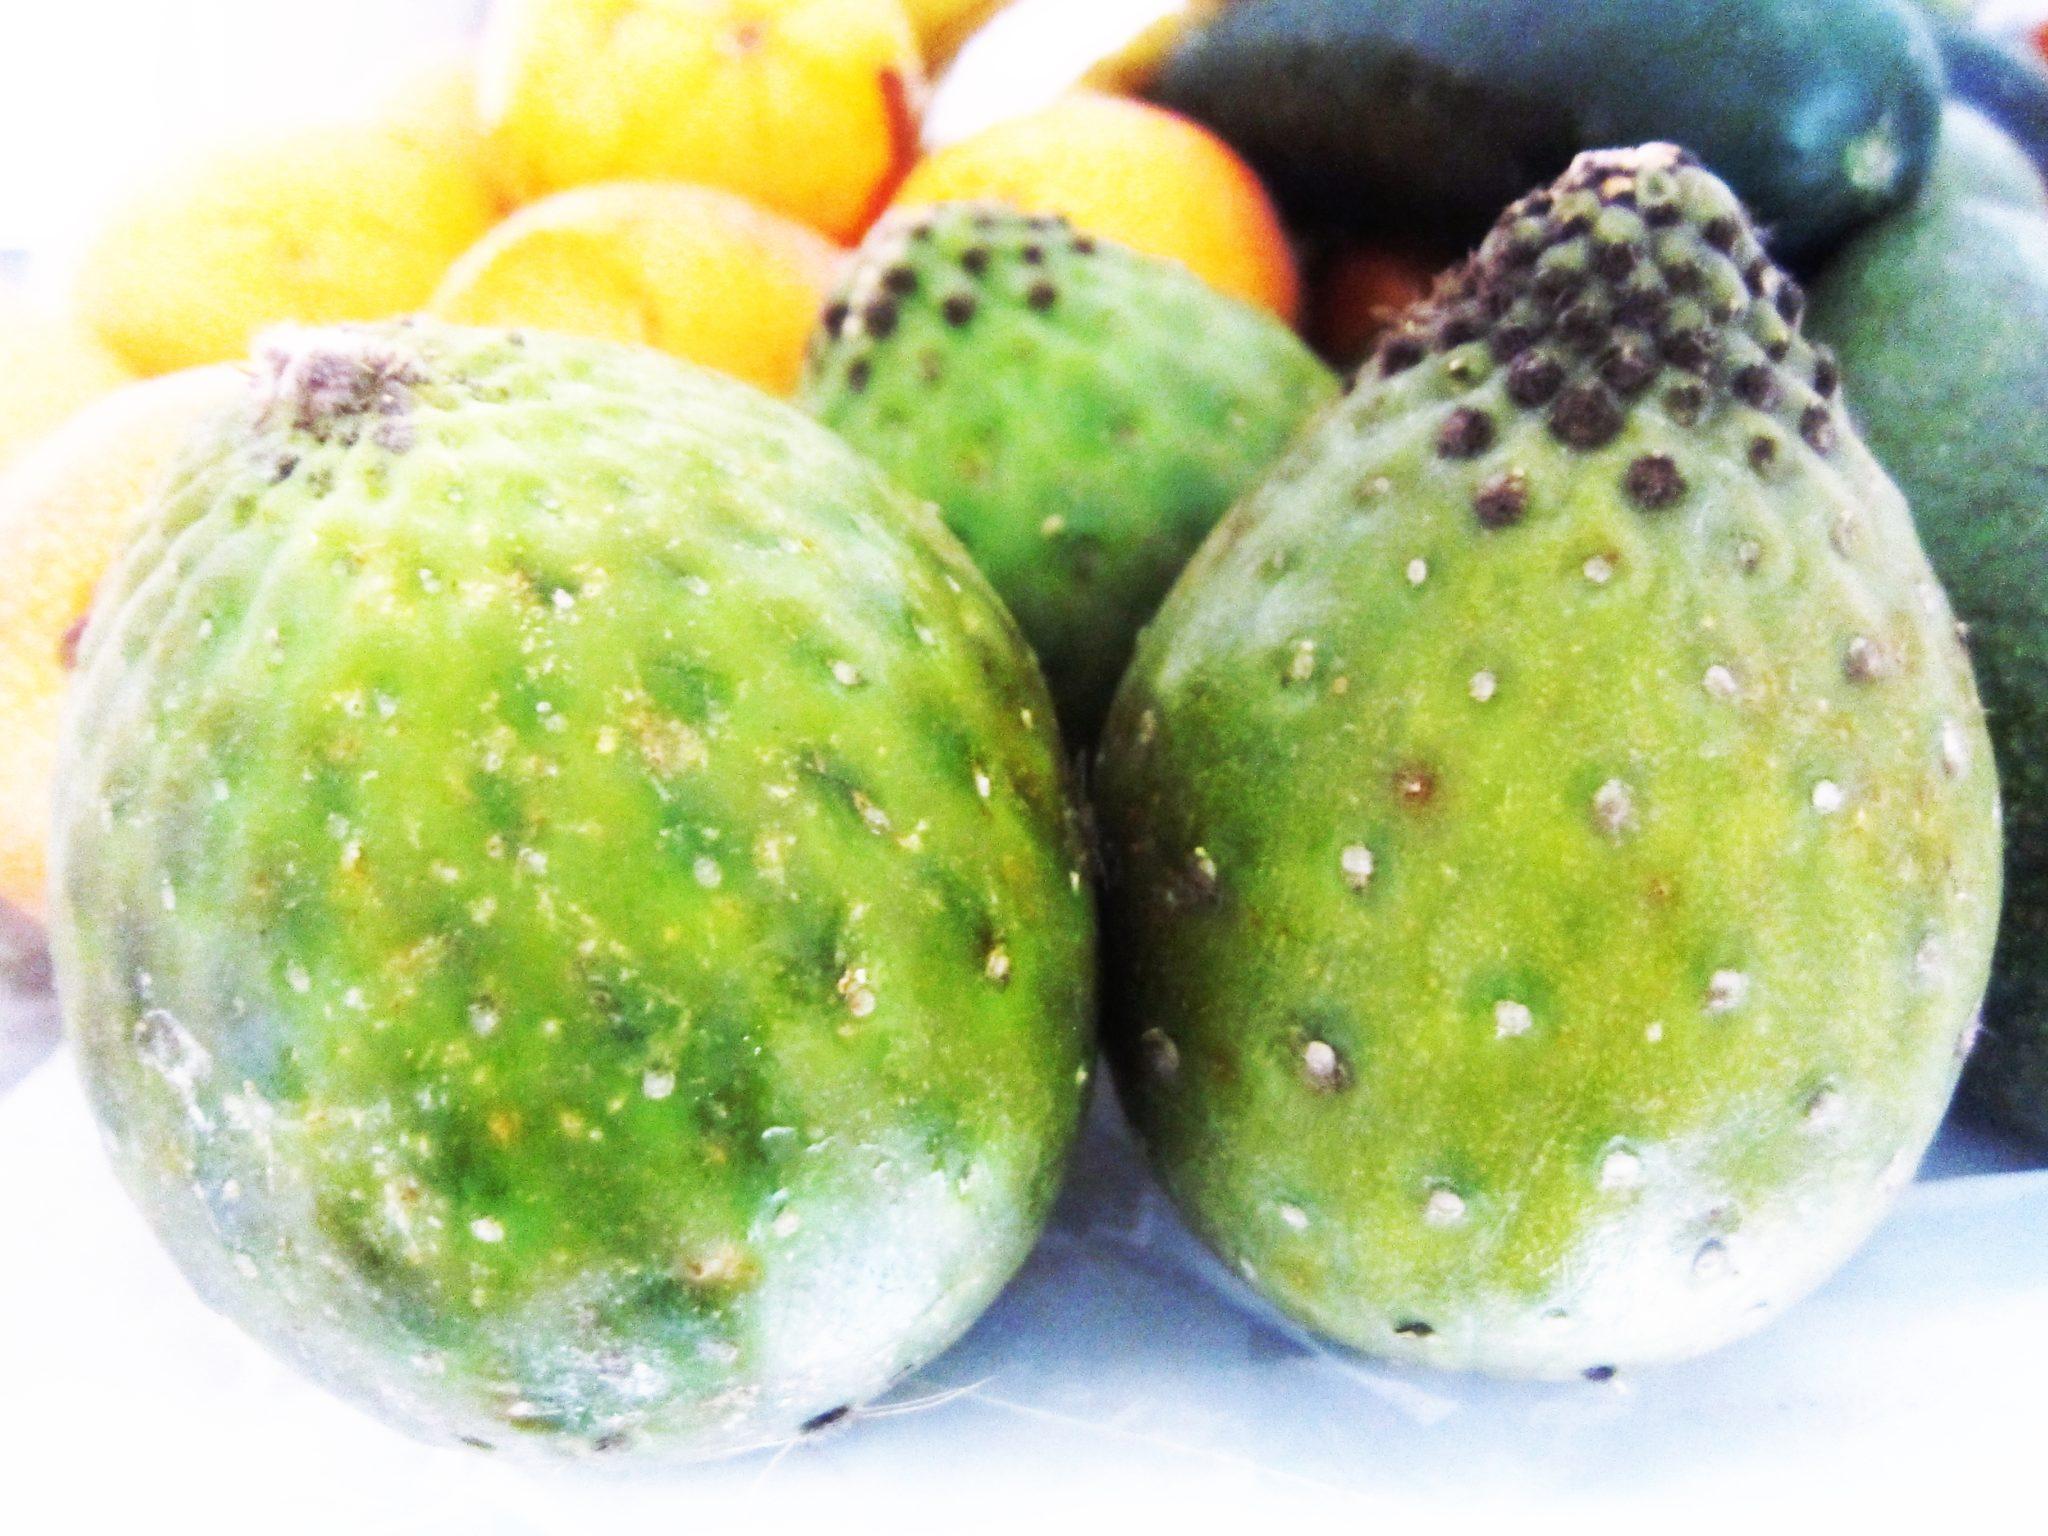 Sanky, 南米, ペルー, 果物, サンキ, 栄養, 効能, 効果